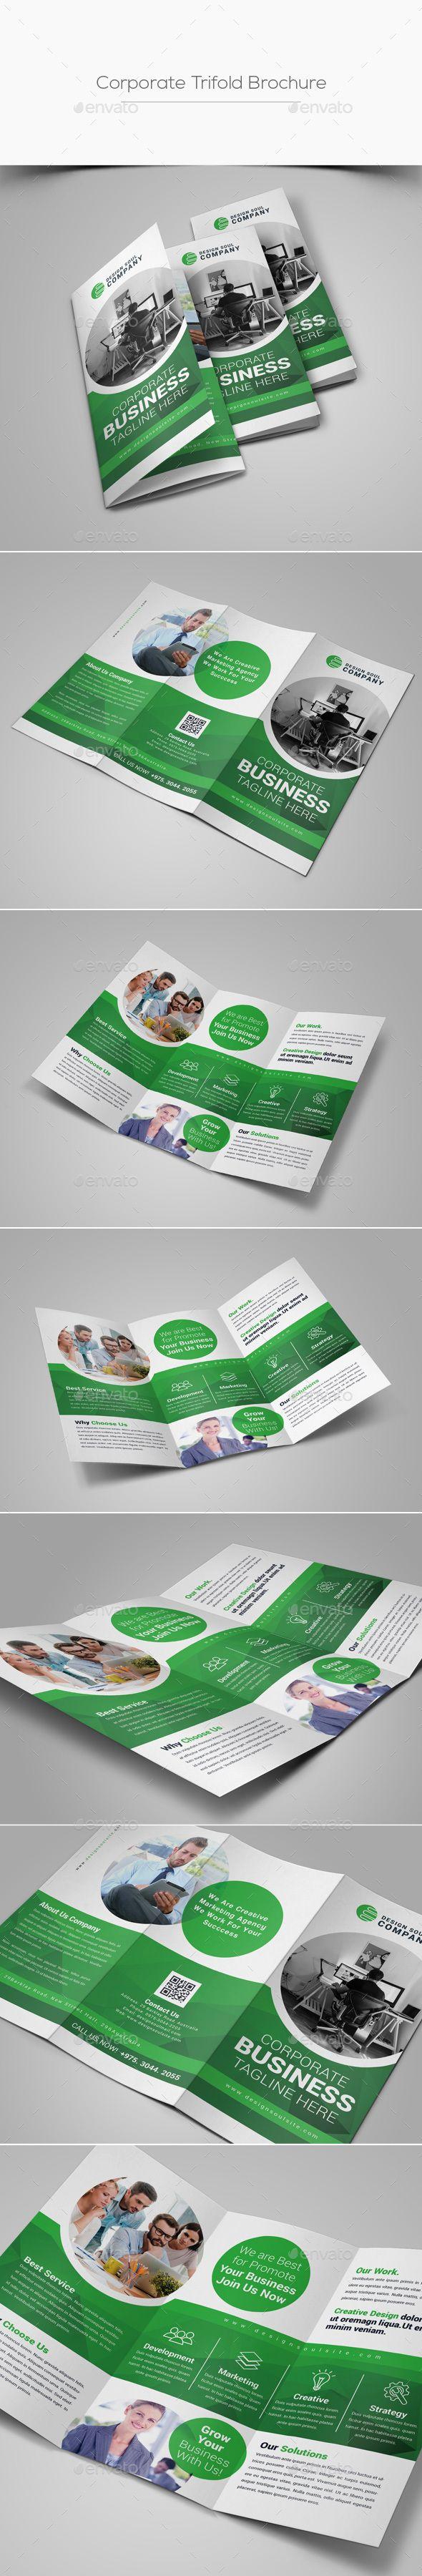 Printable Tri Fold Brochure Template Trifold Brochure  Corporate Brochures #brochure #templates#design .